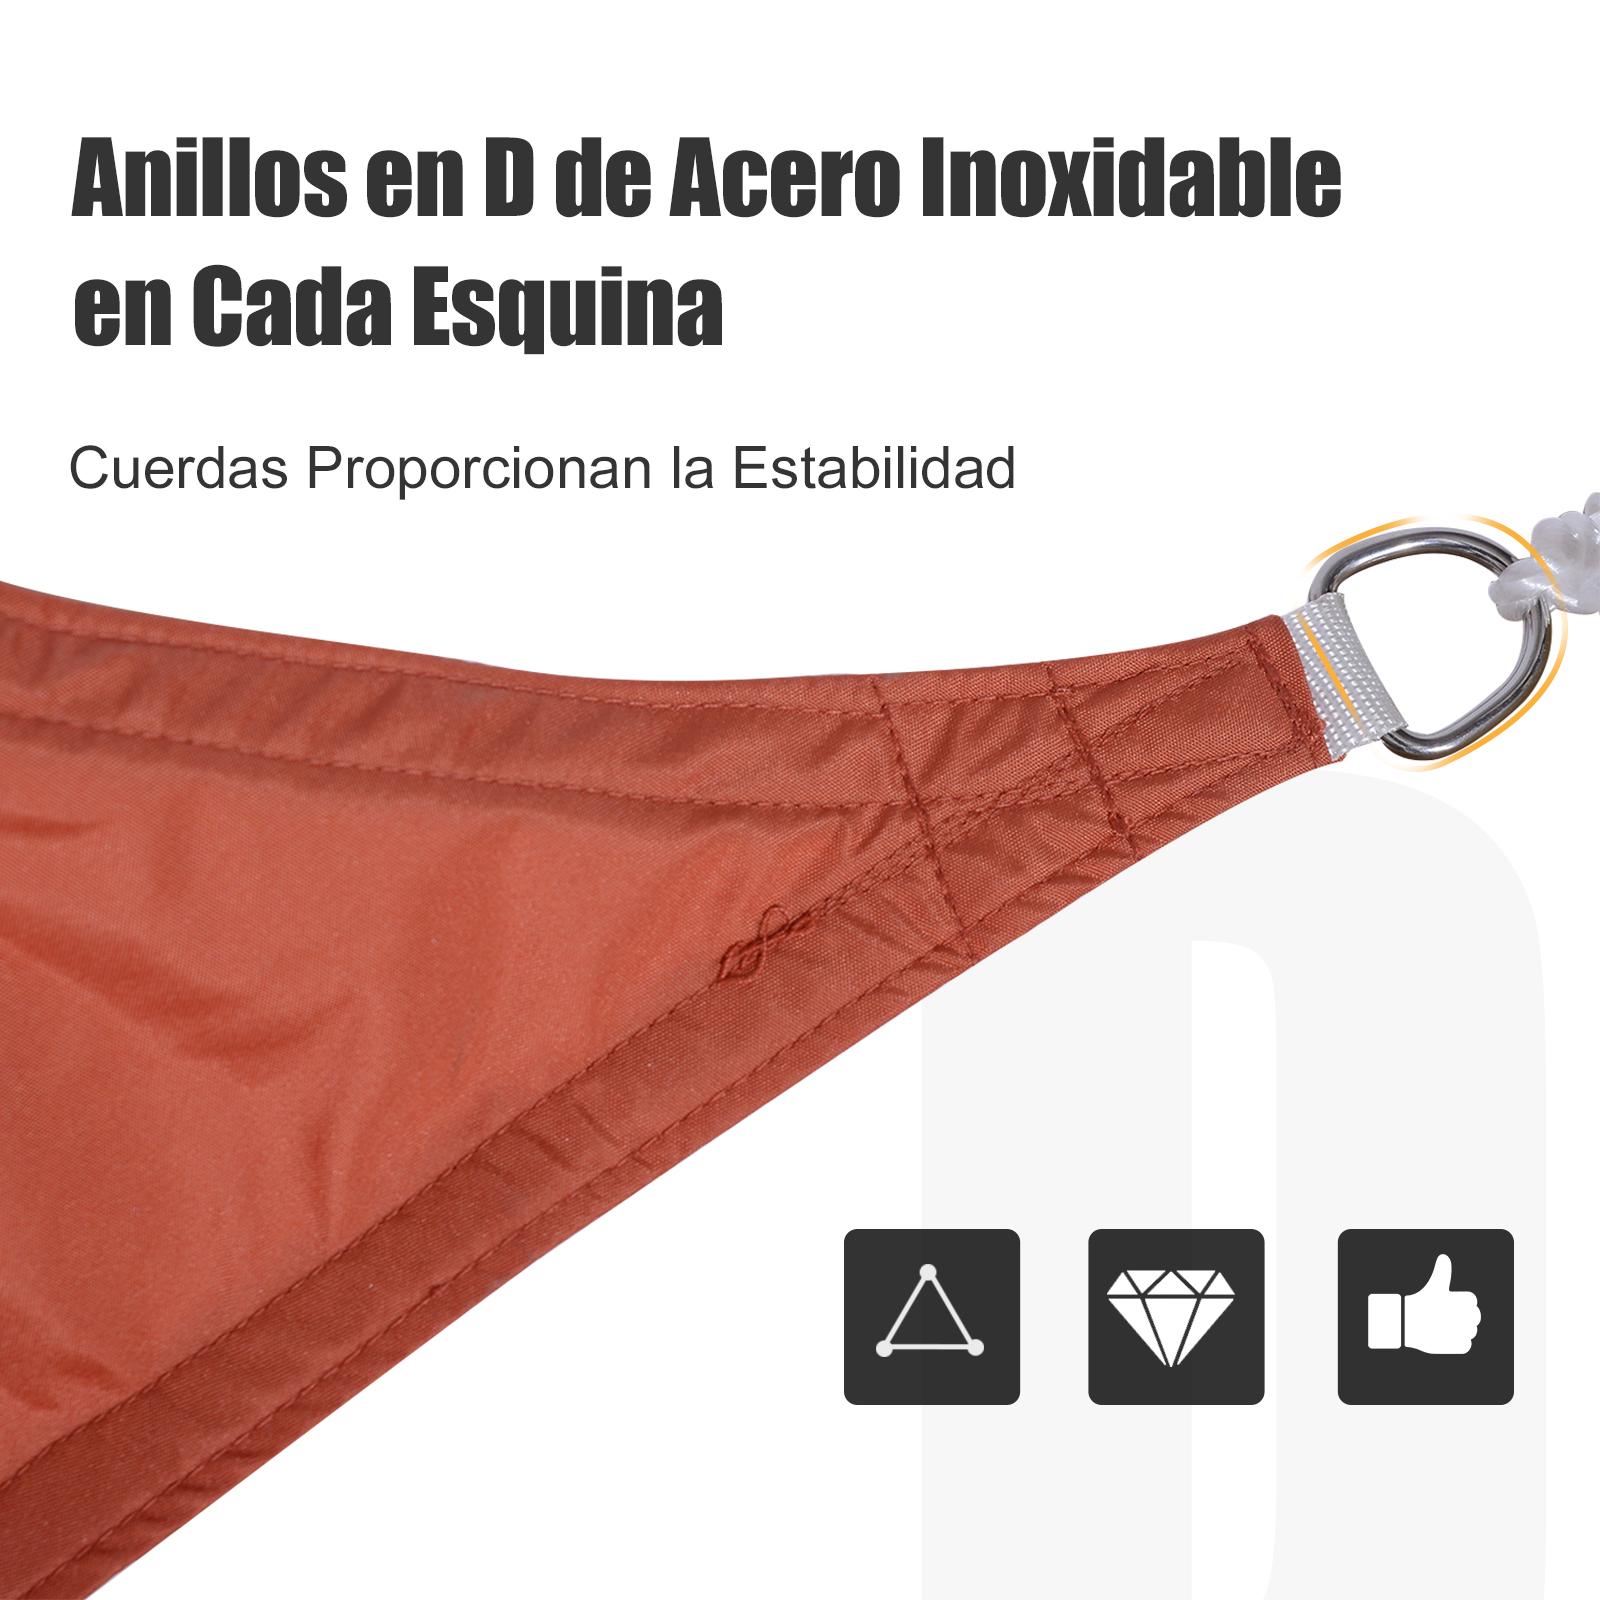 Toldo-Vela-Sombrilla-Parasol-Triangulo-Tejido-de-Poliester-160g-m2-Jardin-Playa miniatura 25